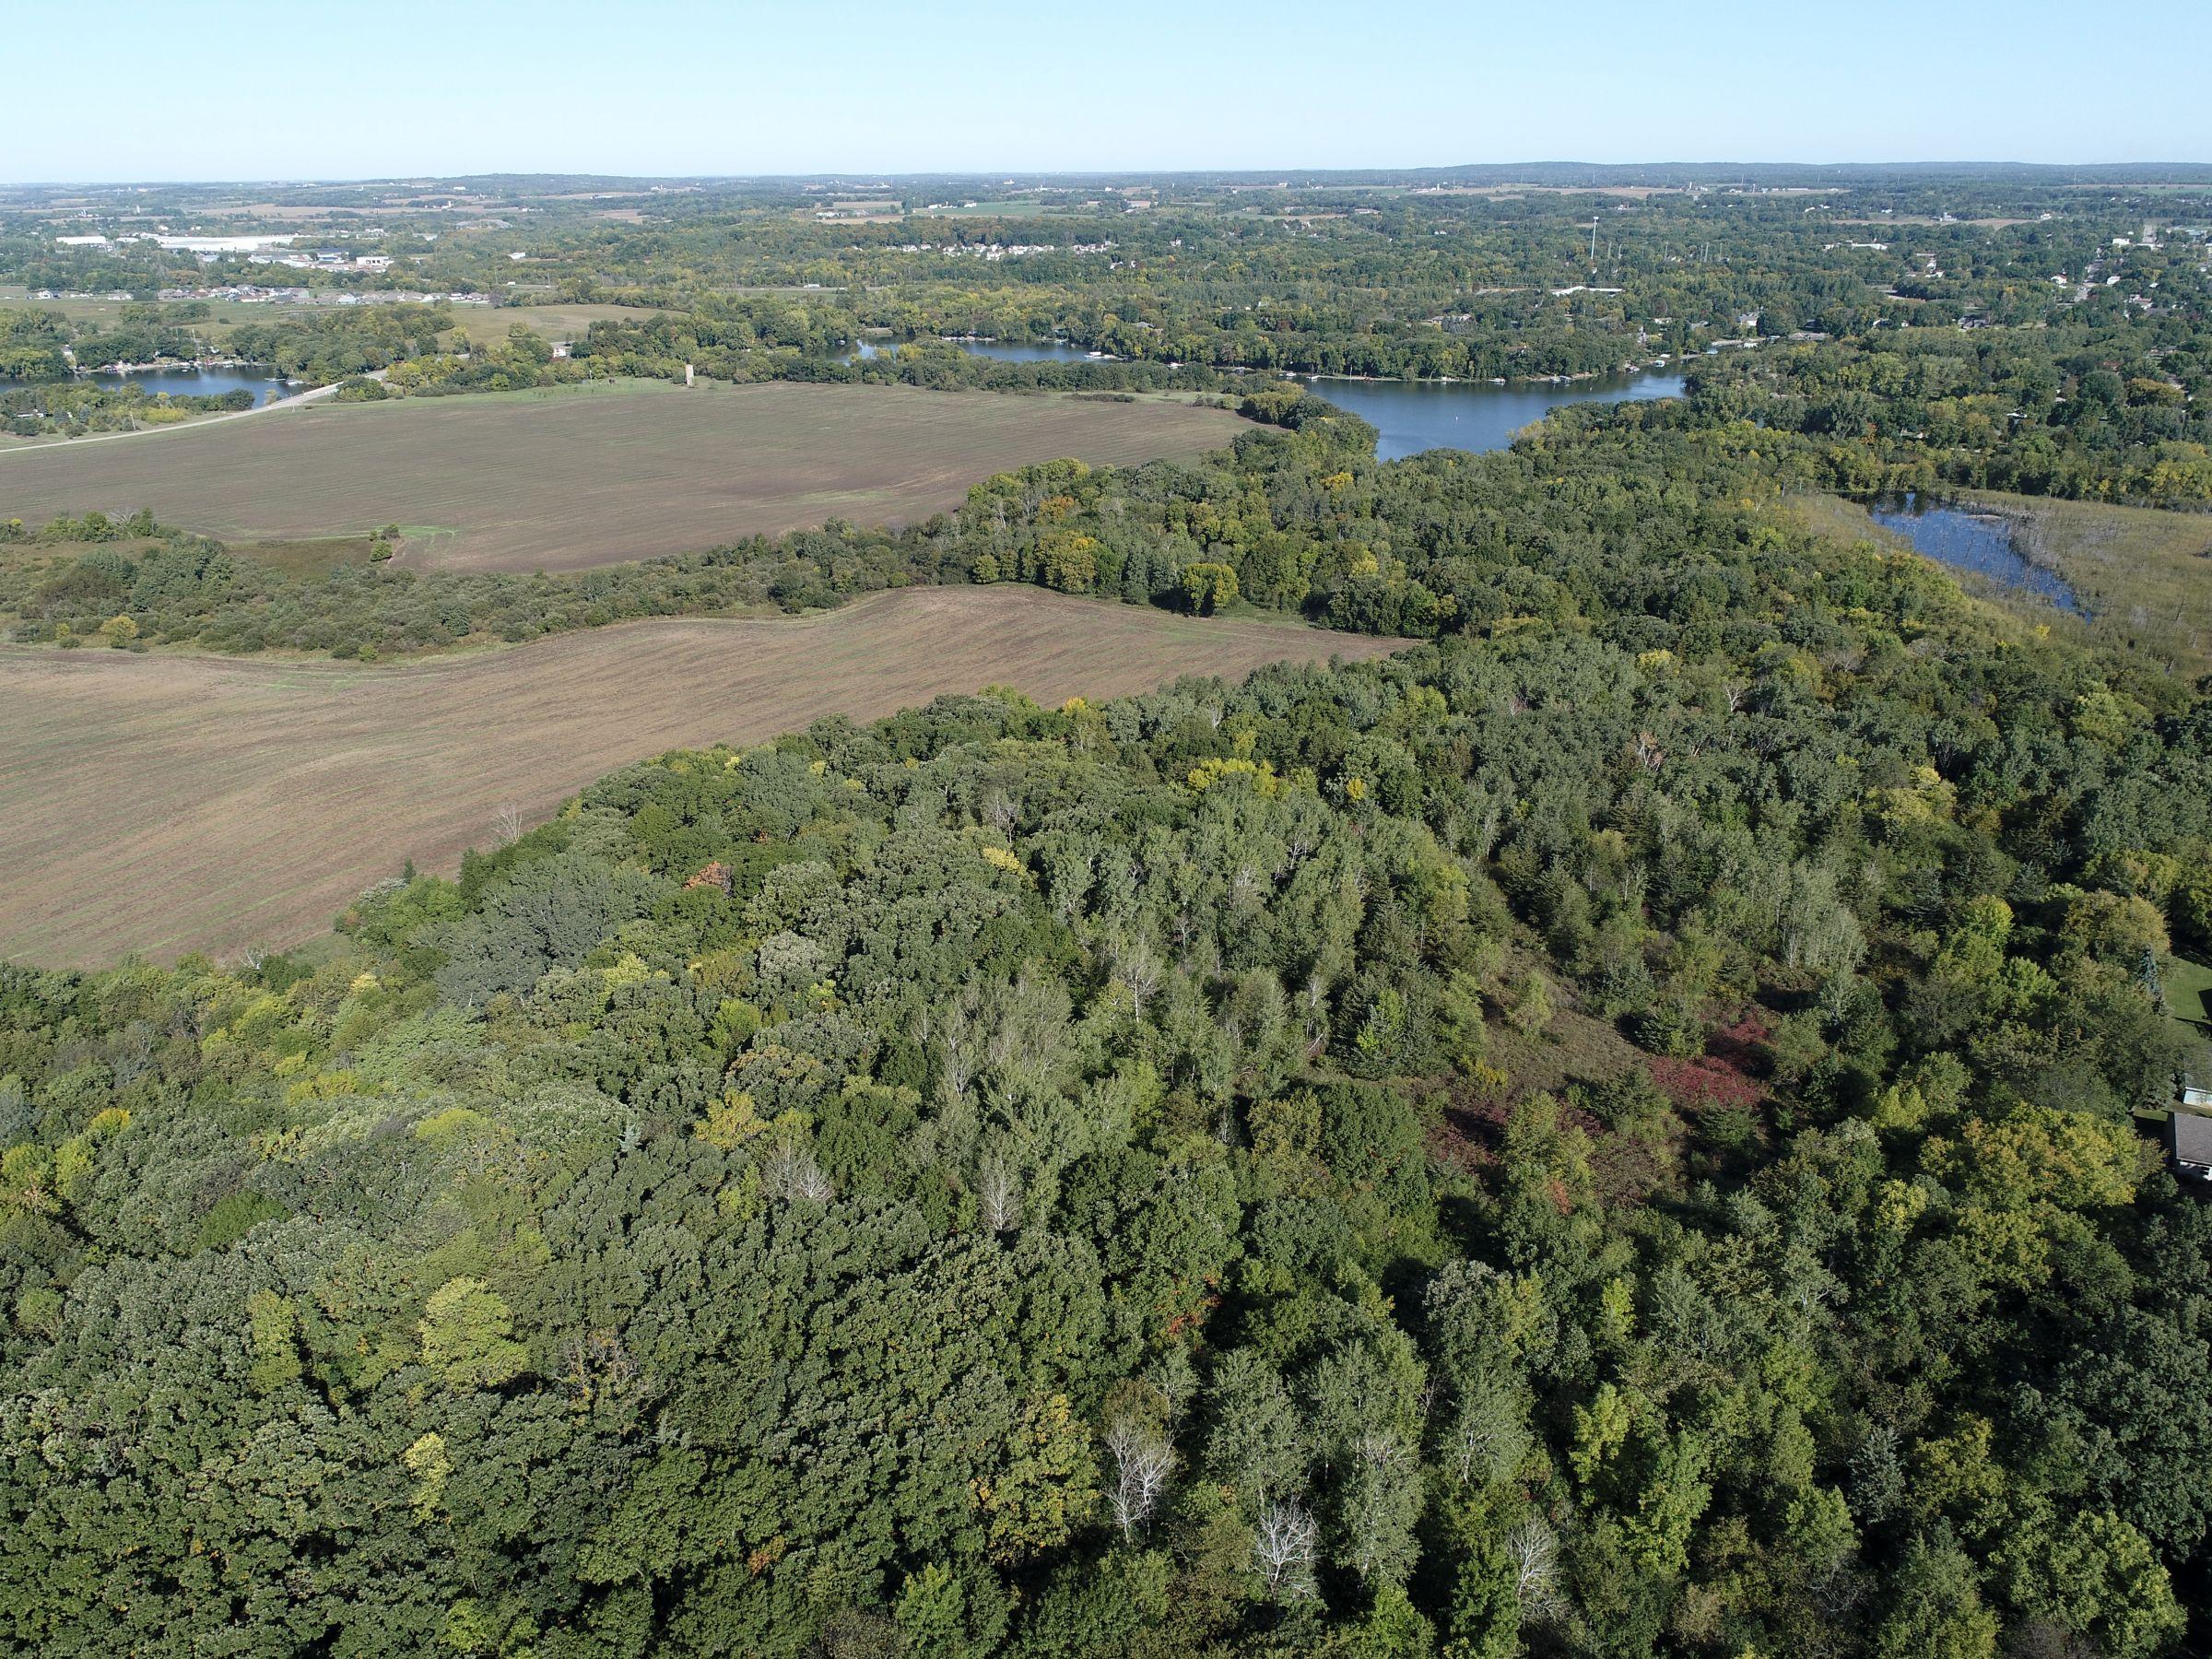 land-stearns-county-minnesota-298-acres-listing-number-15712-0-2021-09-23-123656.JPG